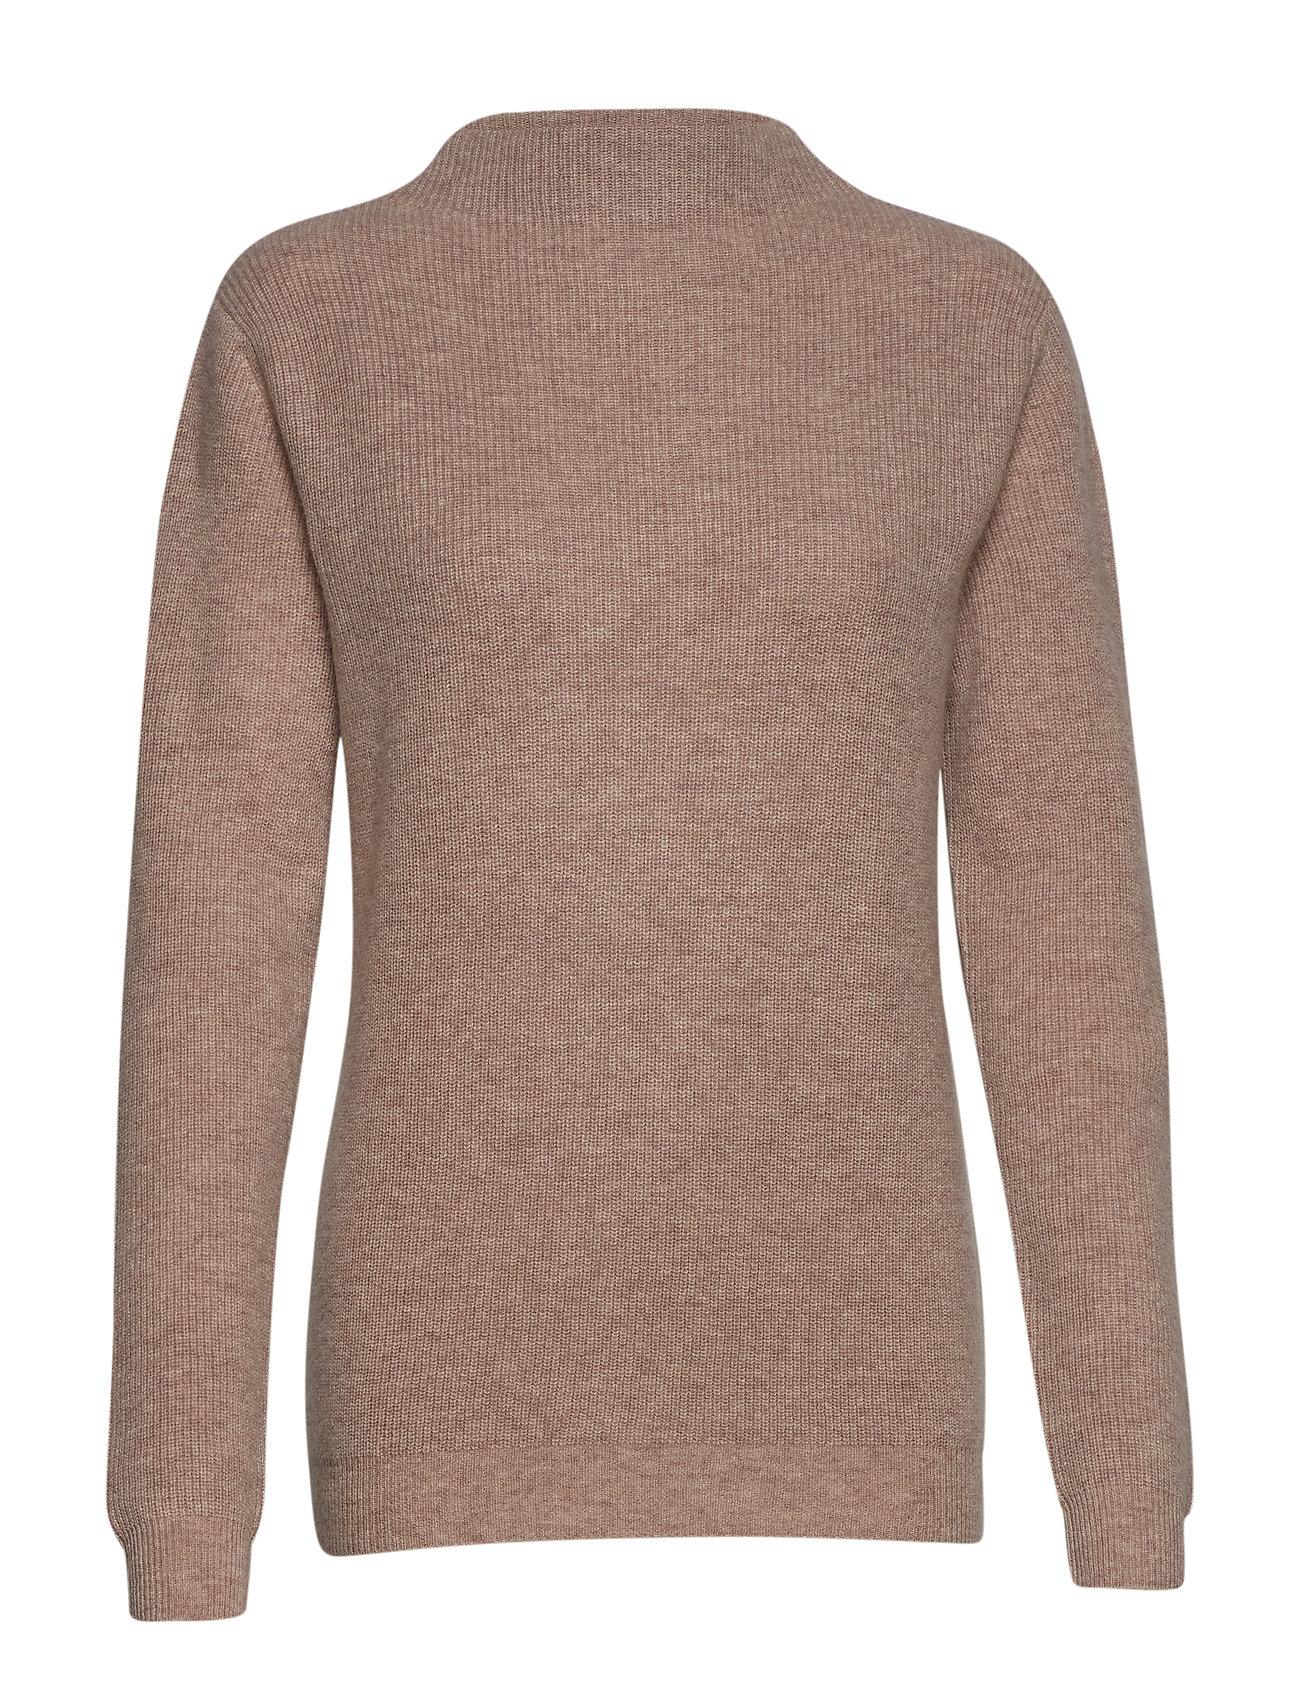 Davida Cashmere Rib Funnel Neck Sweater - SAND